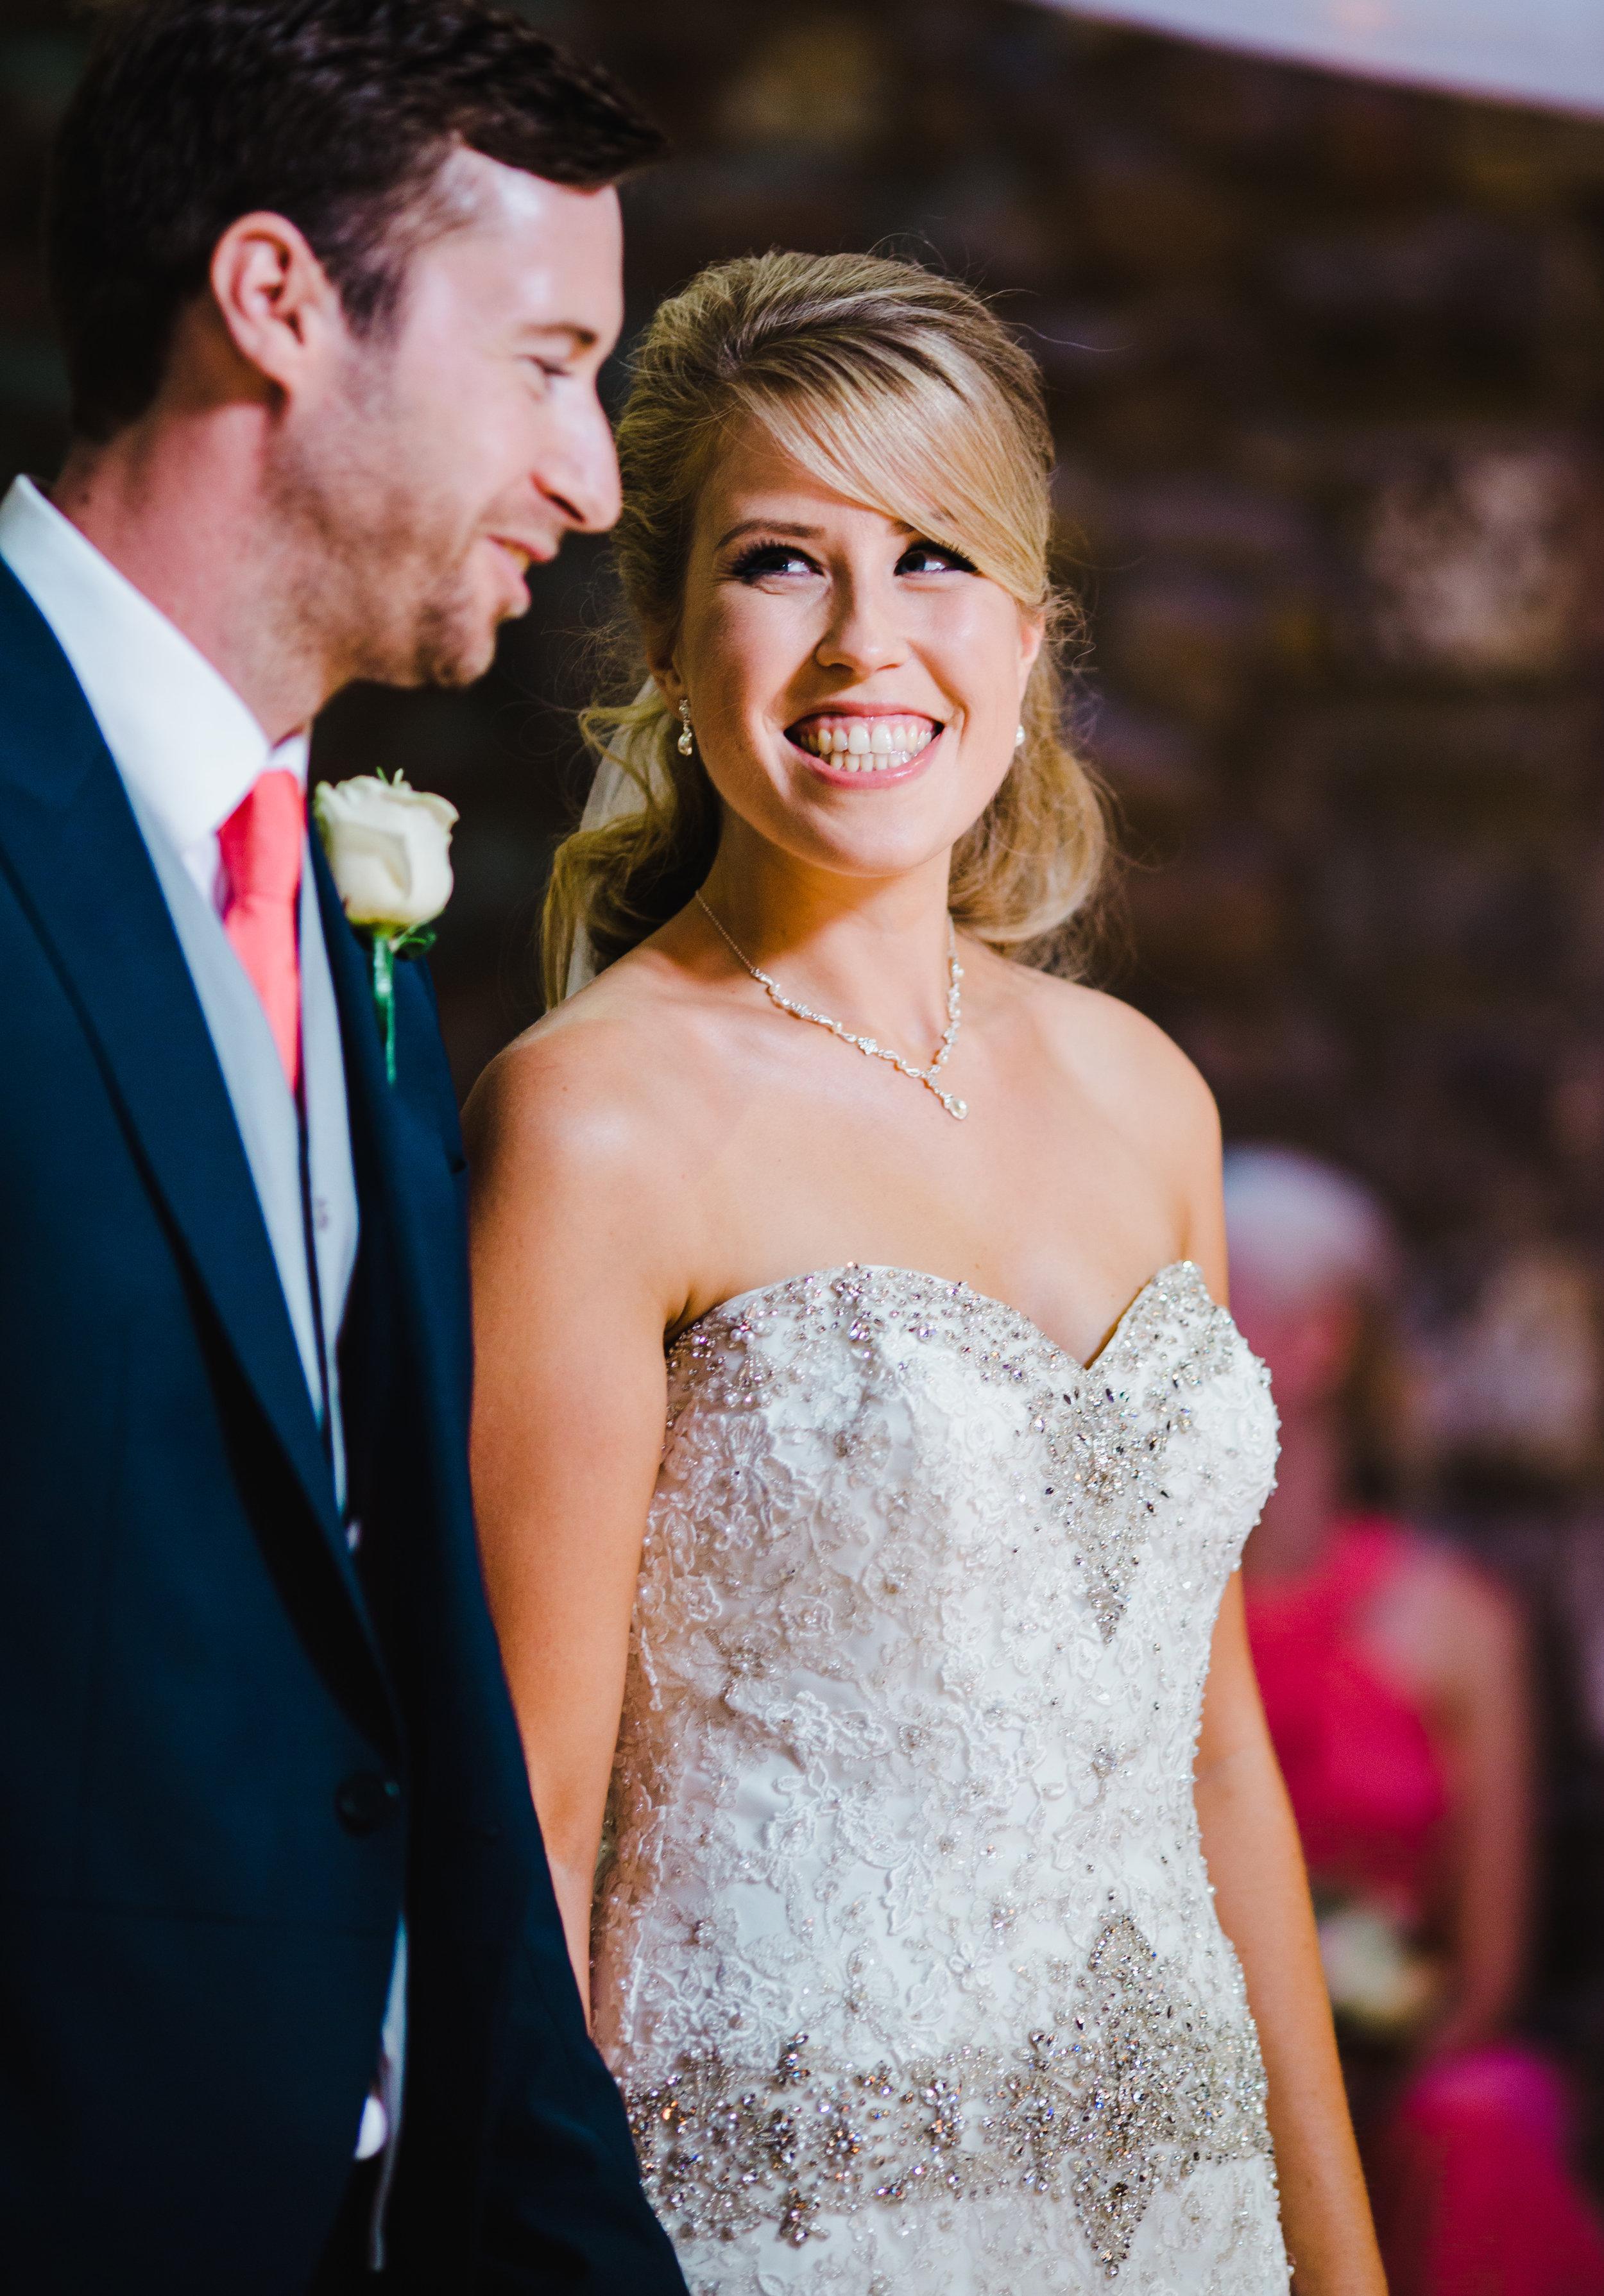 natural wedding photography at Browsholme Hall Lancashire